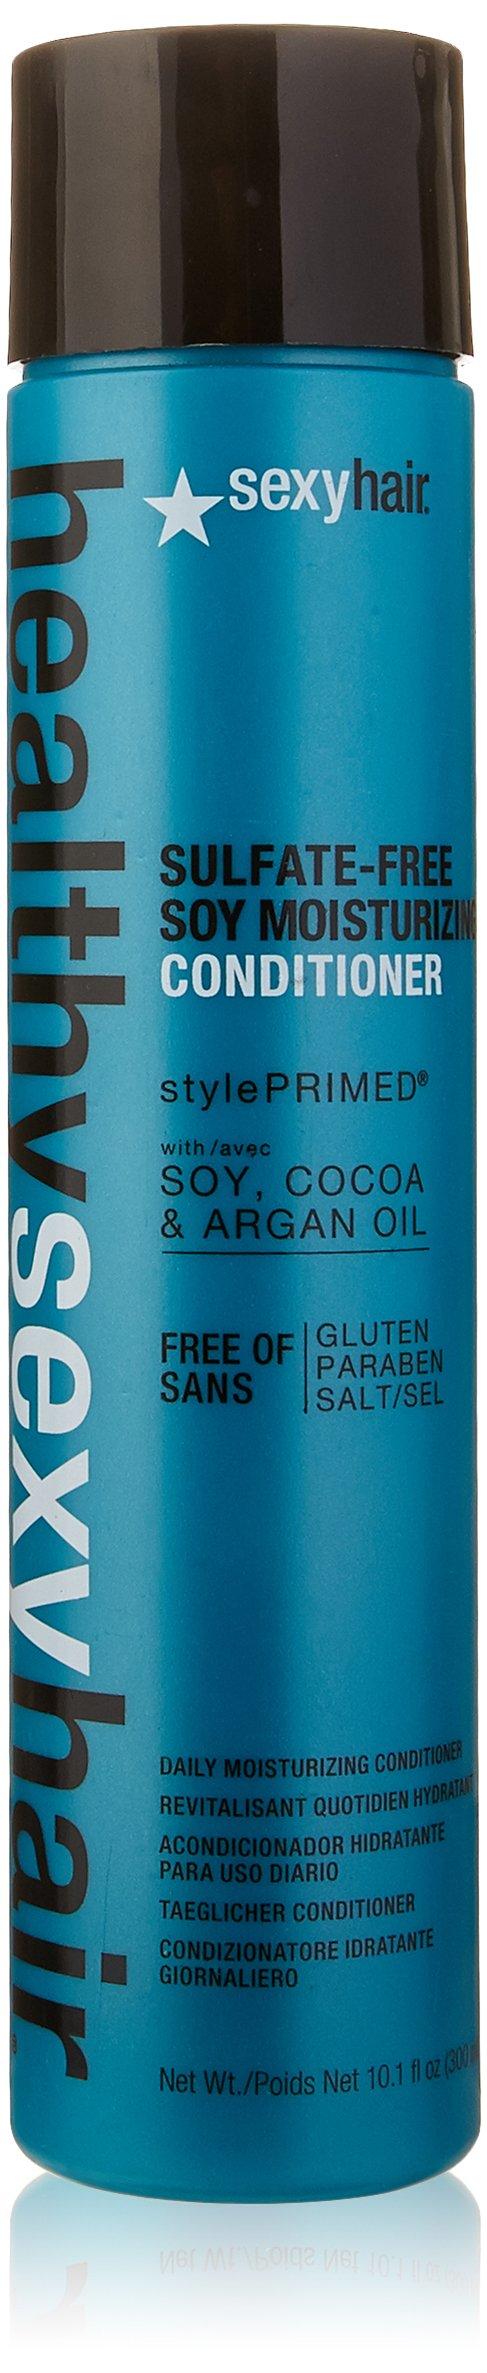 Sexy Hair Healthy Sexy Hair Color Safe Soy Moisturizing Conditioner, 10.1 Fluid Ounce